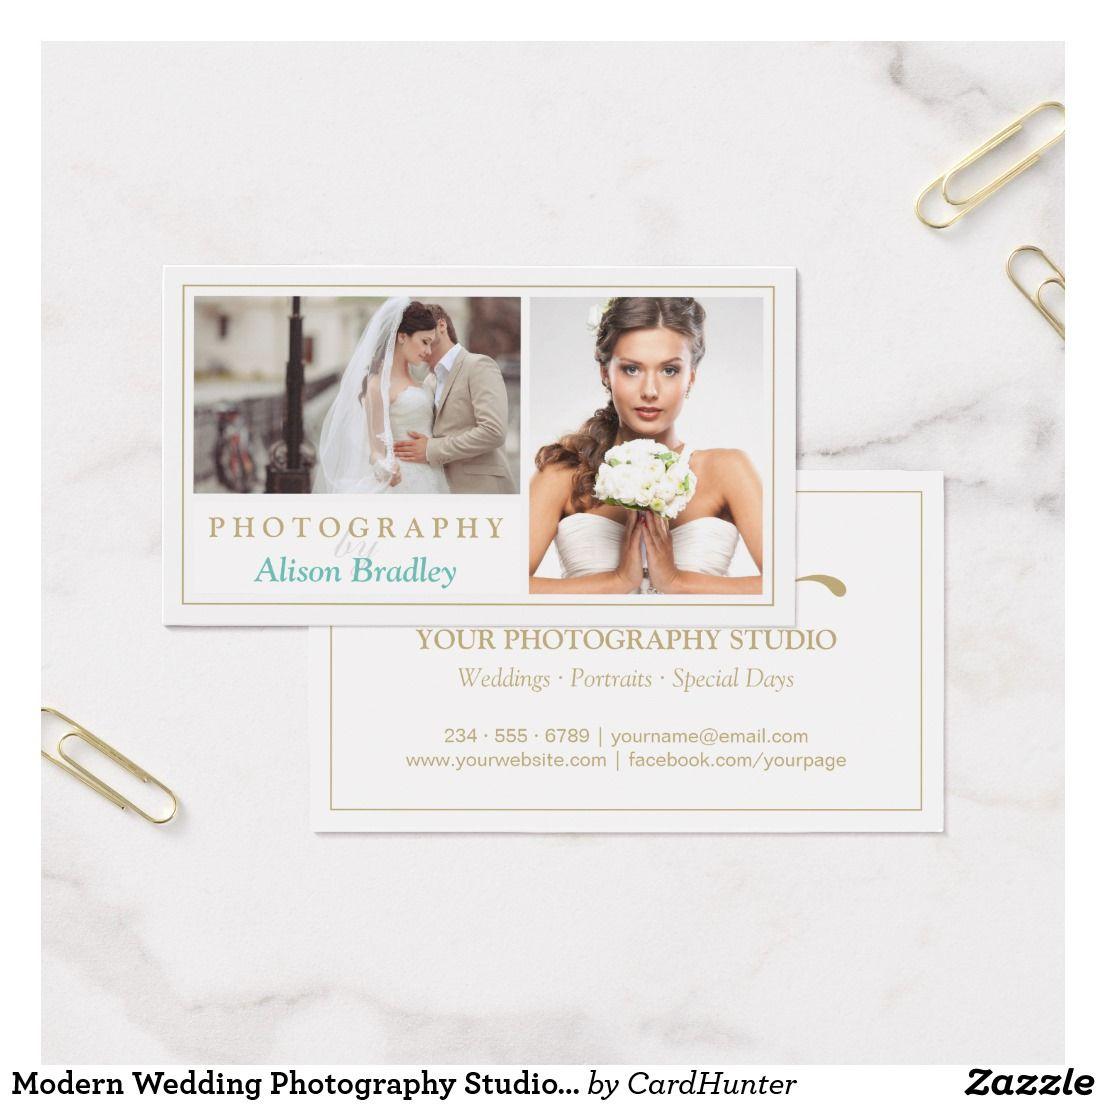 Modern Wedding Photography Studio Elegant Stylish Business Card ...